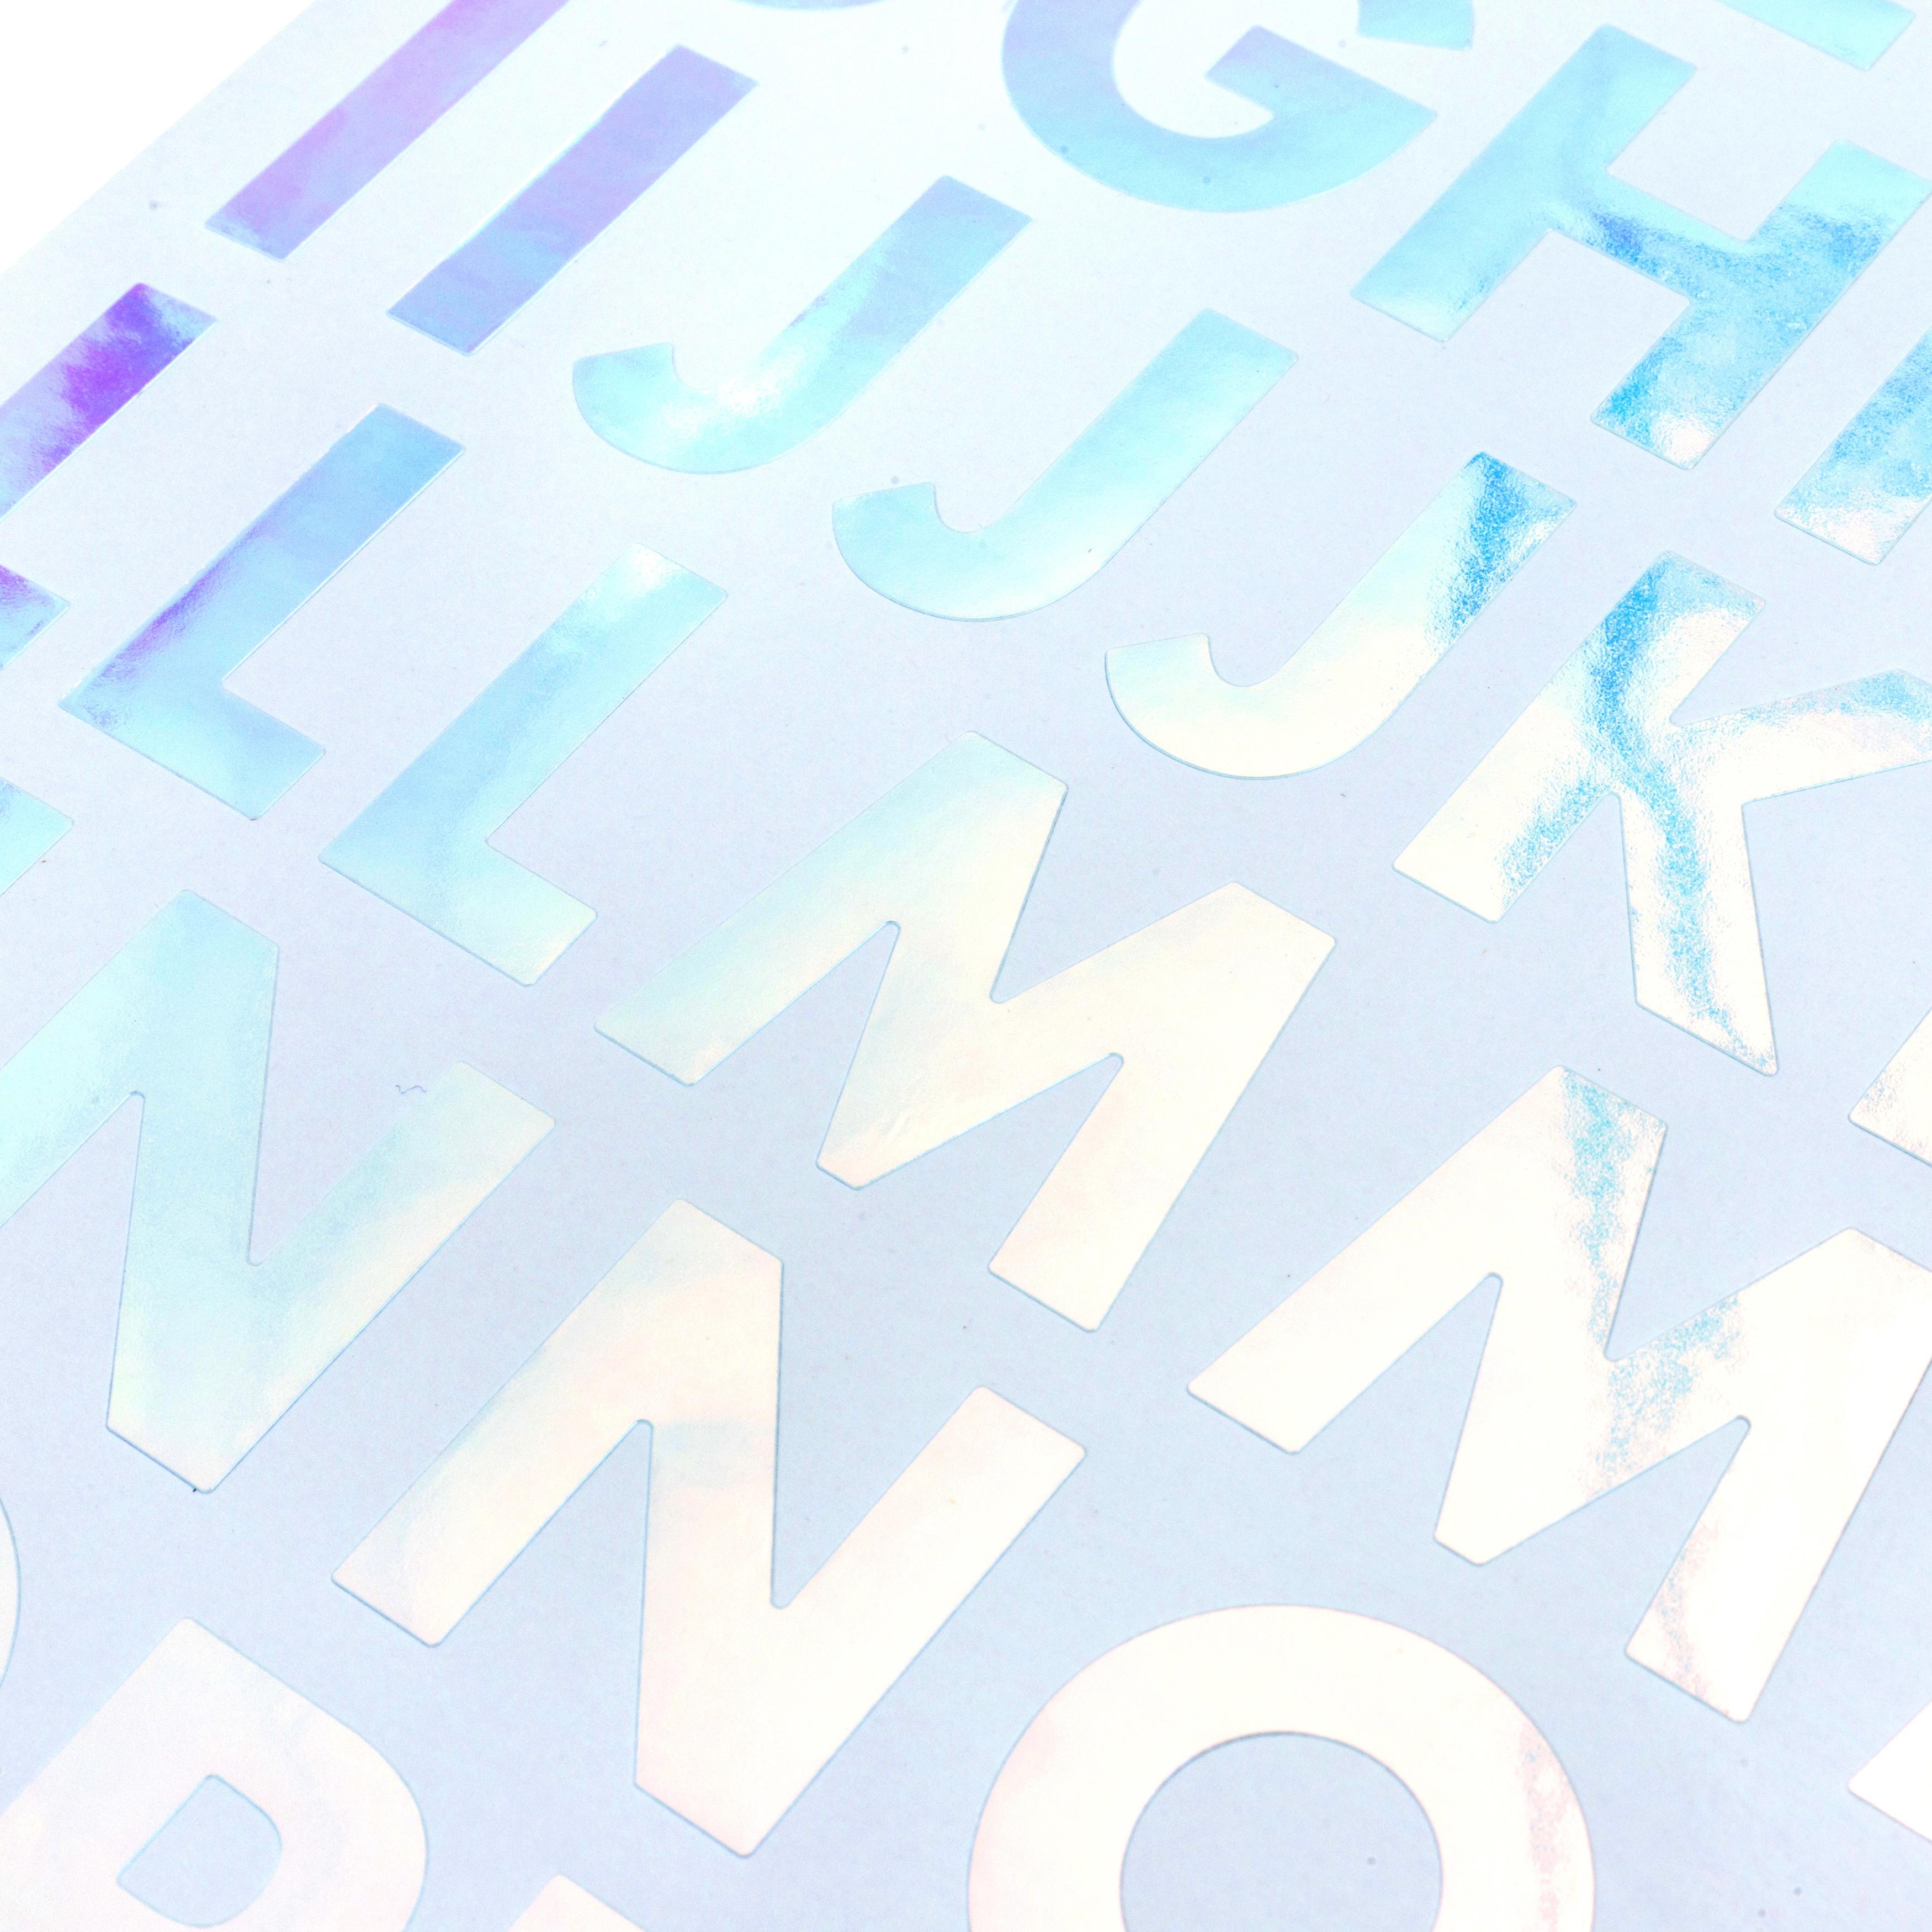 Sticko Iridescent Large Alphabet Stickers-Silver Futura